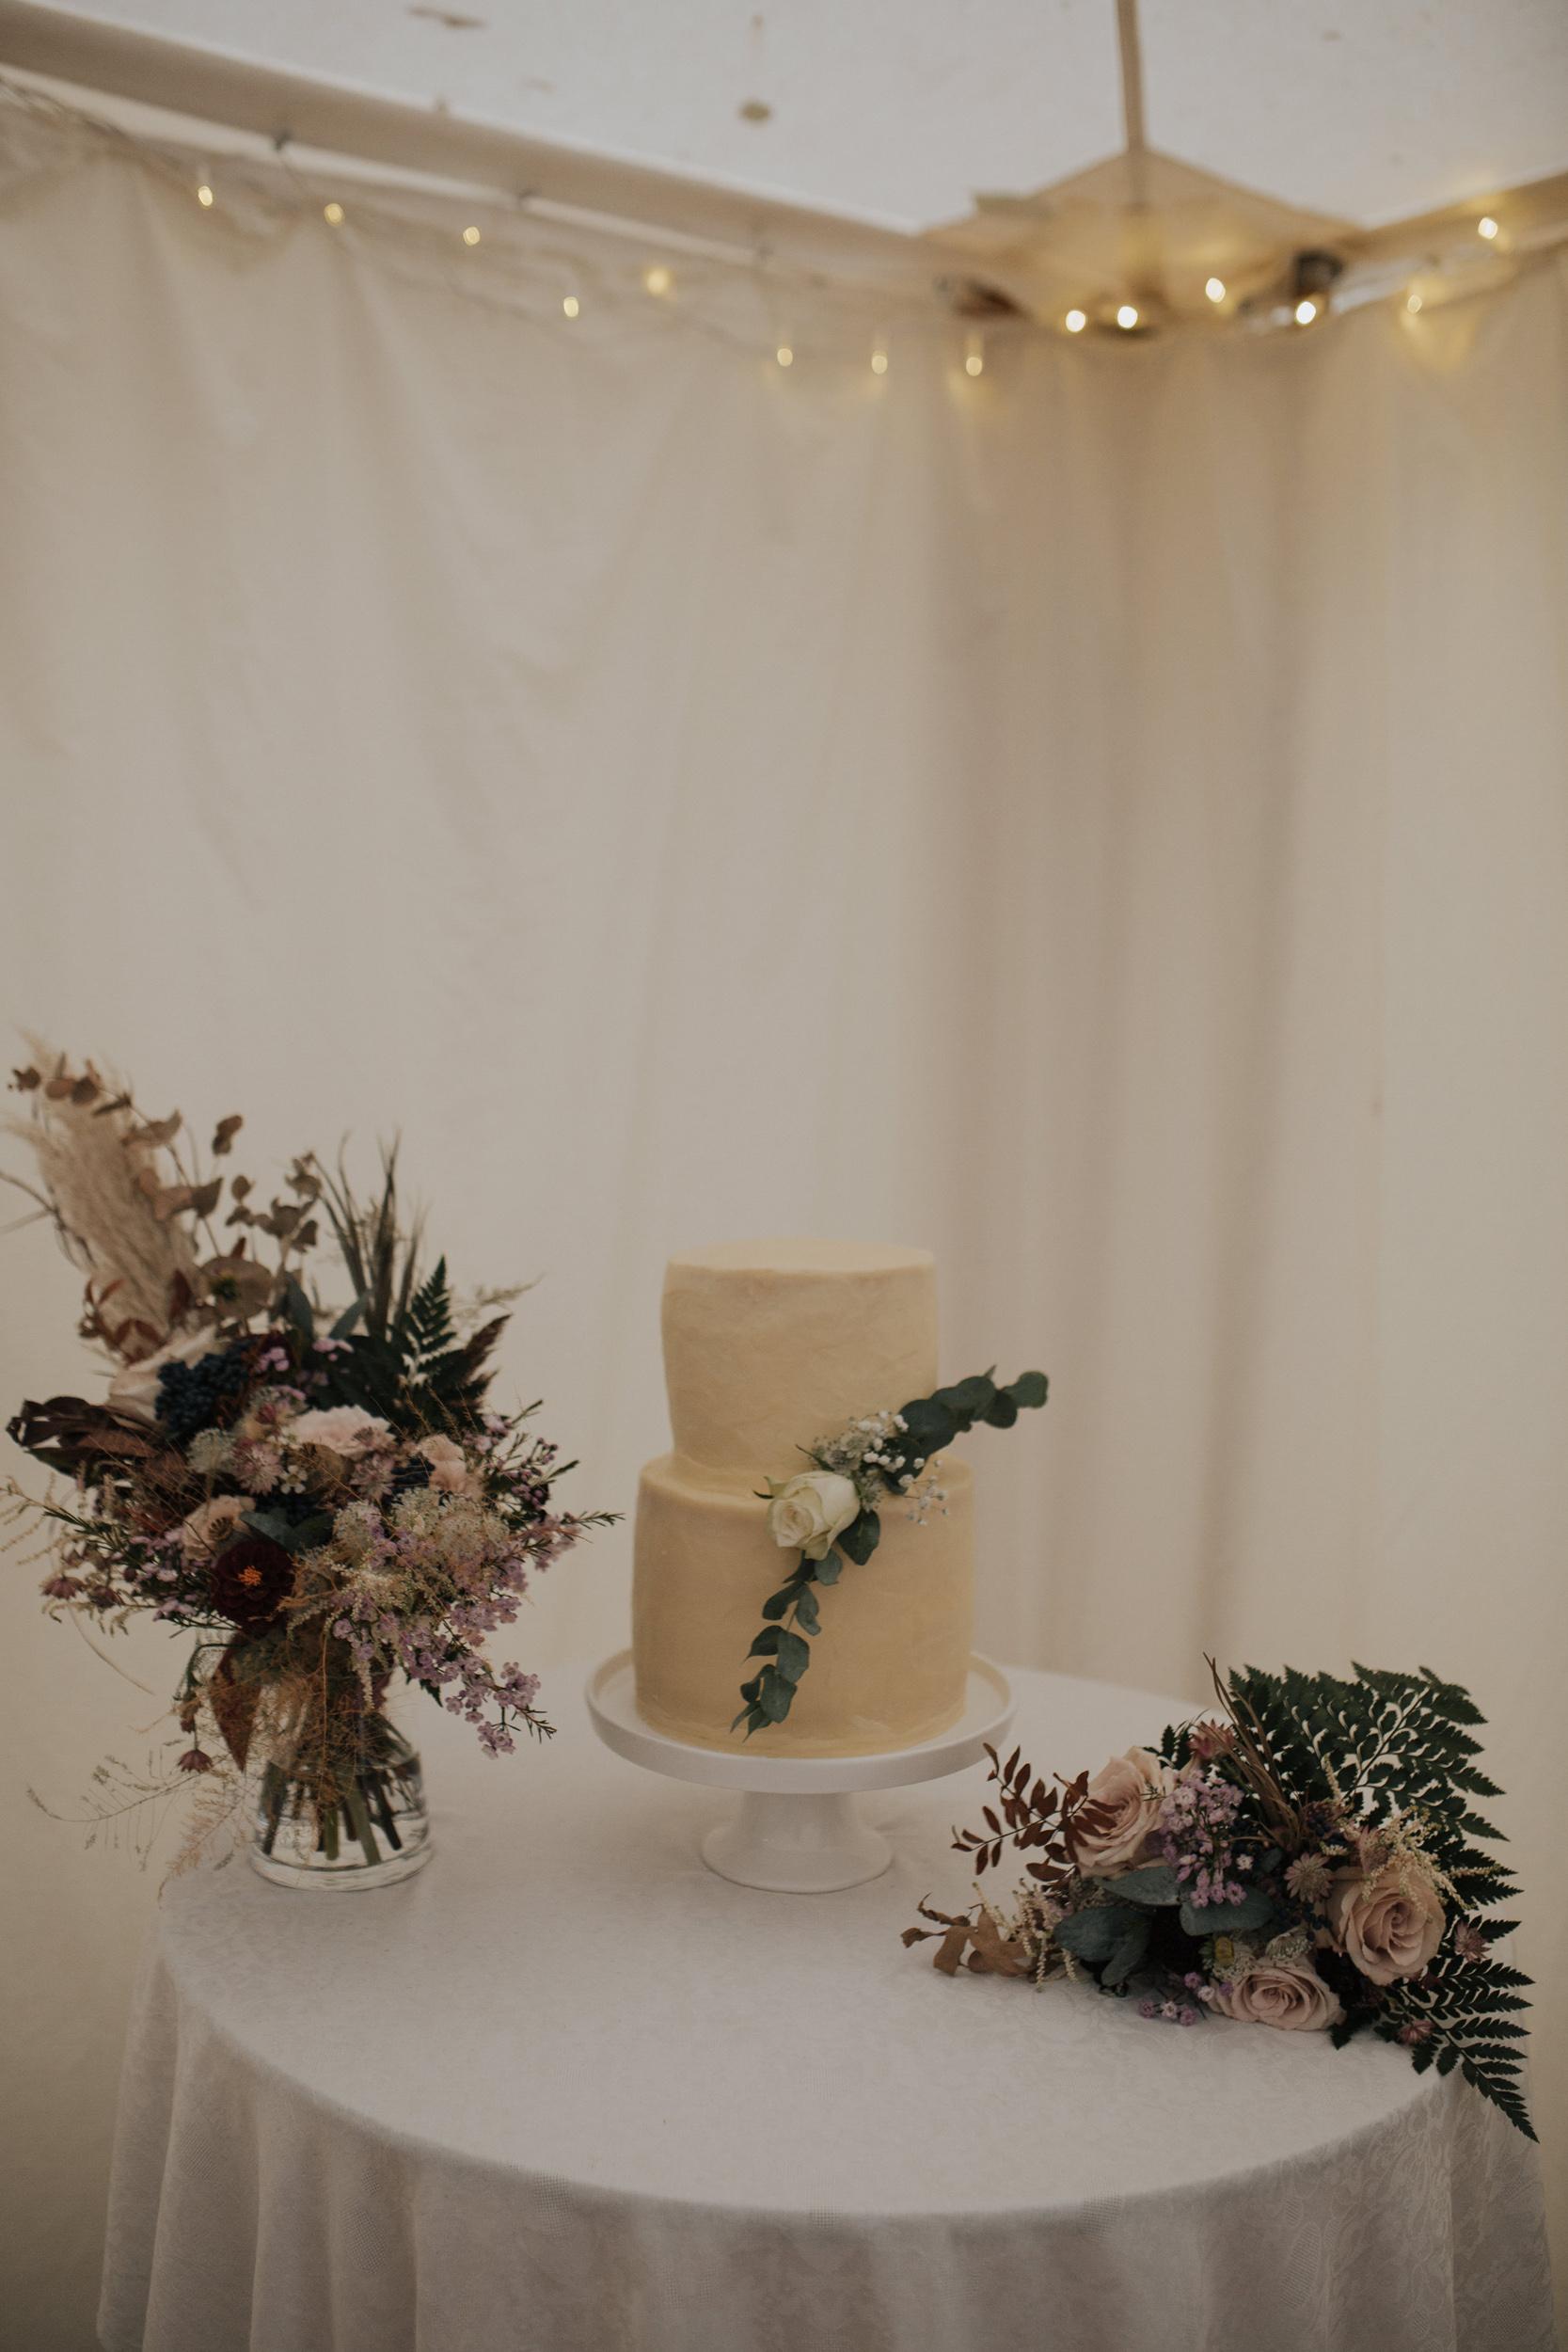 Joasia-Kate-Beaumont-Bohemian-Lace-Wedding-Dress-Peak-District-Sheffield-Wedding-49.jpg